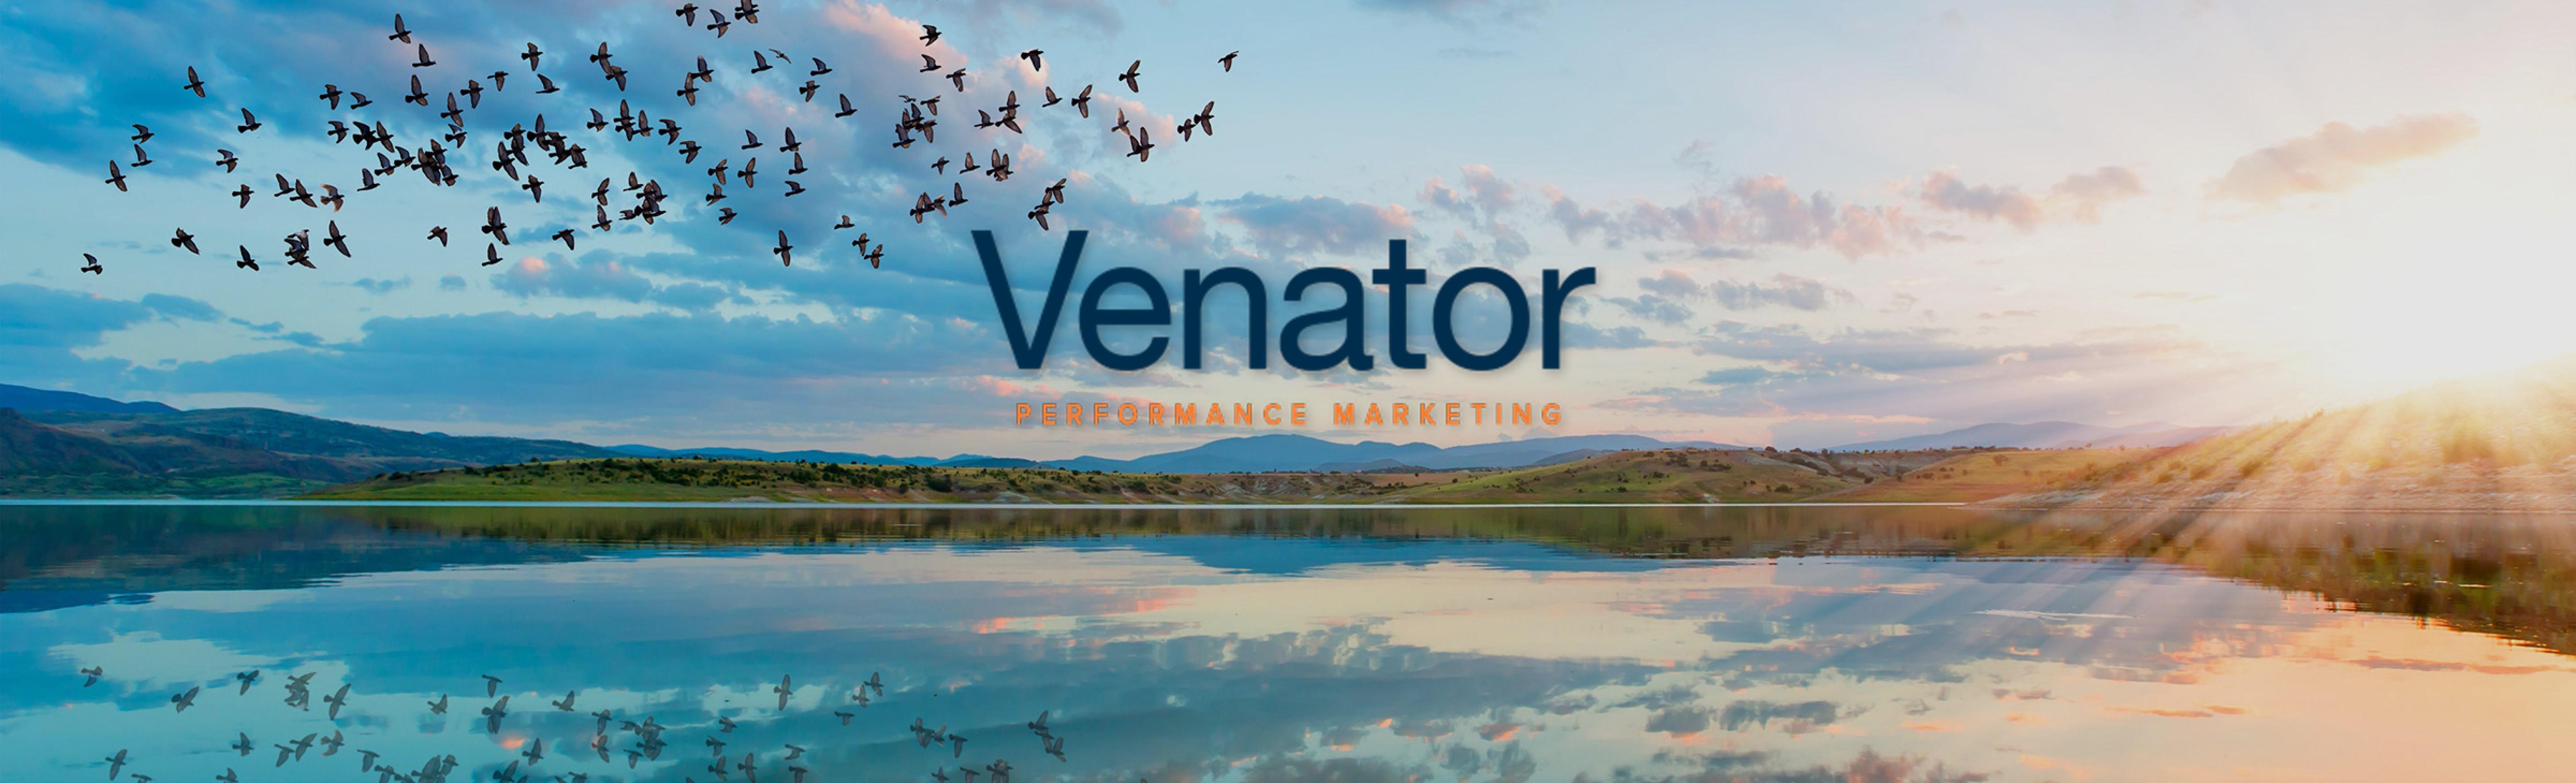 Venator Performance Marketing | LinkedIn